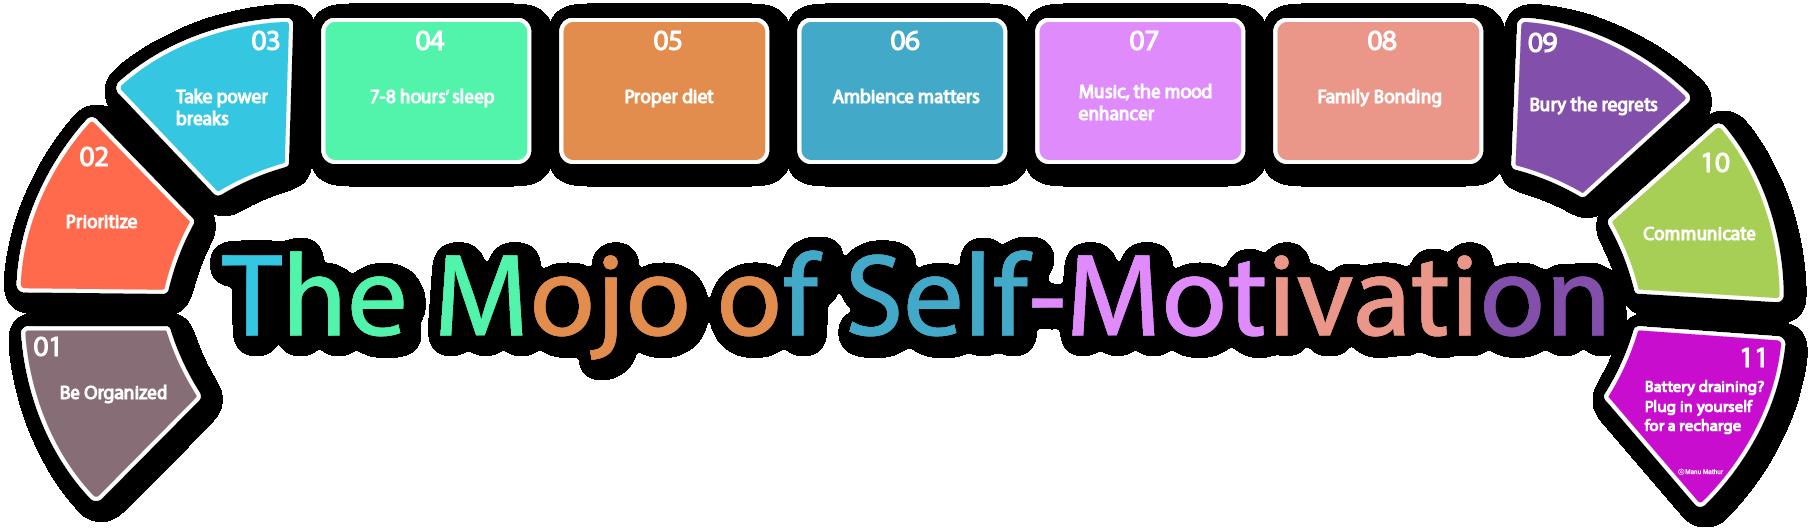 self-motivation-infographic